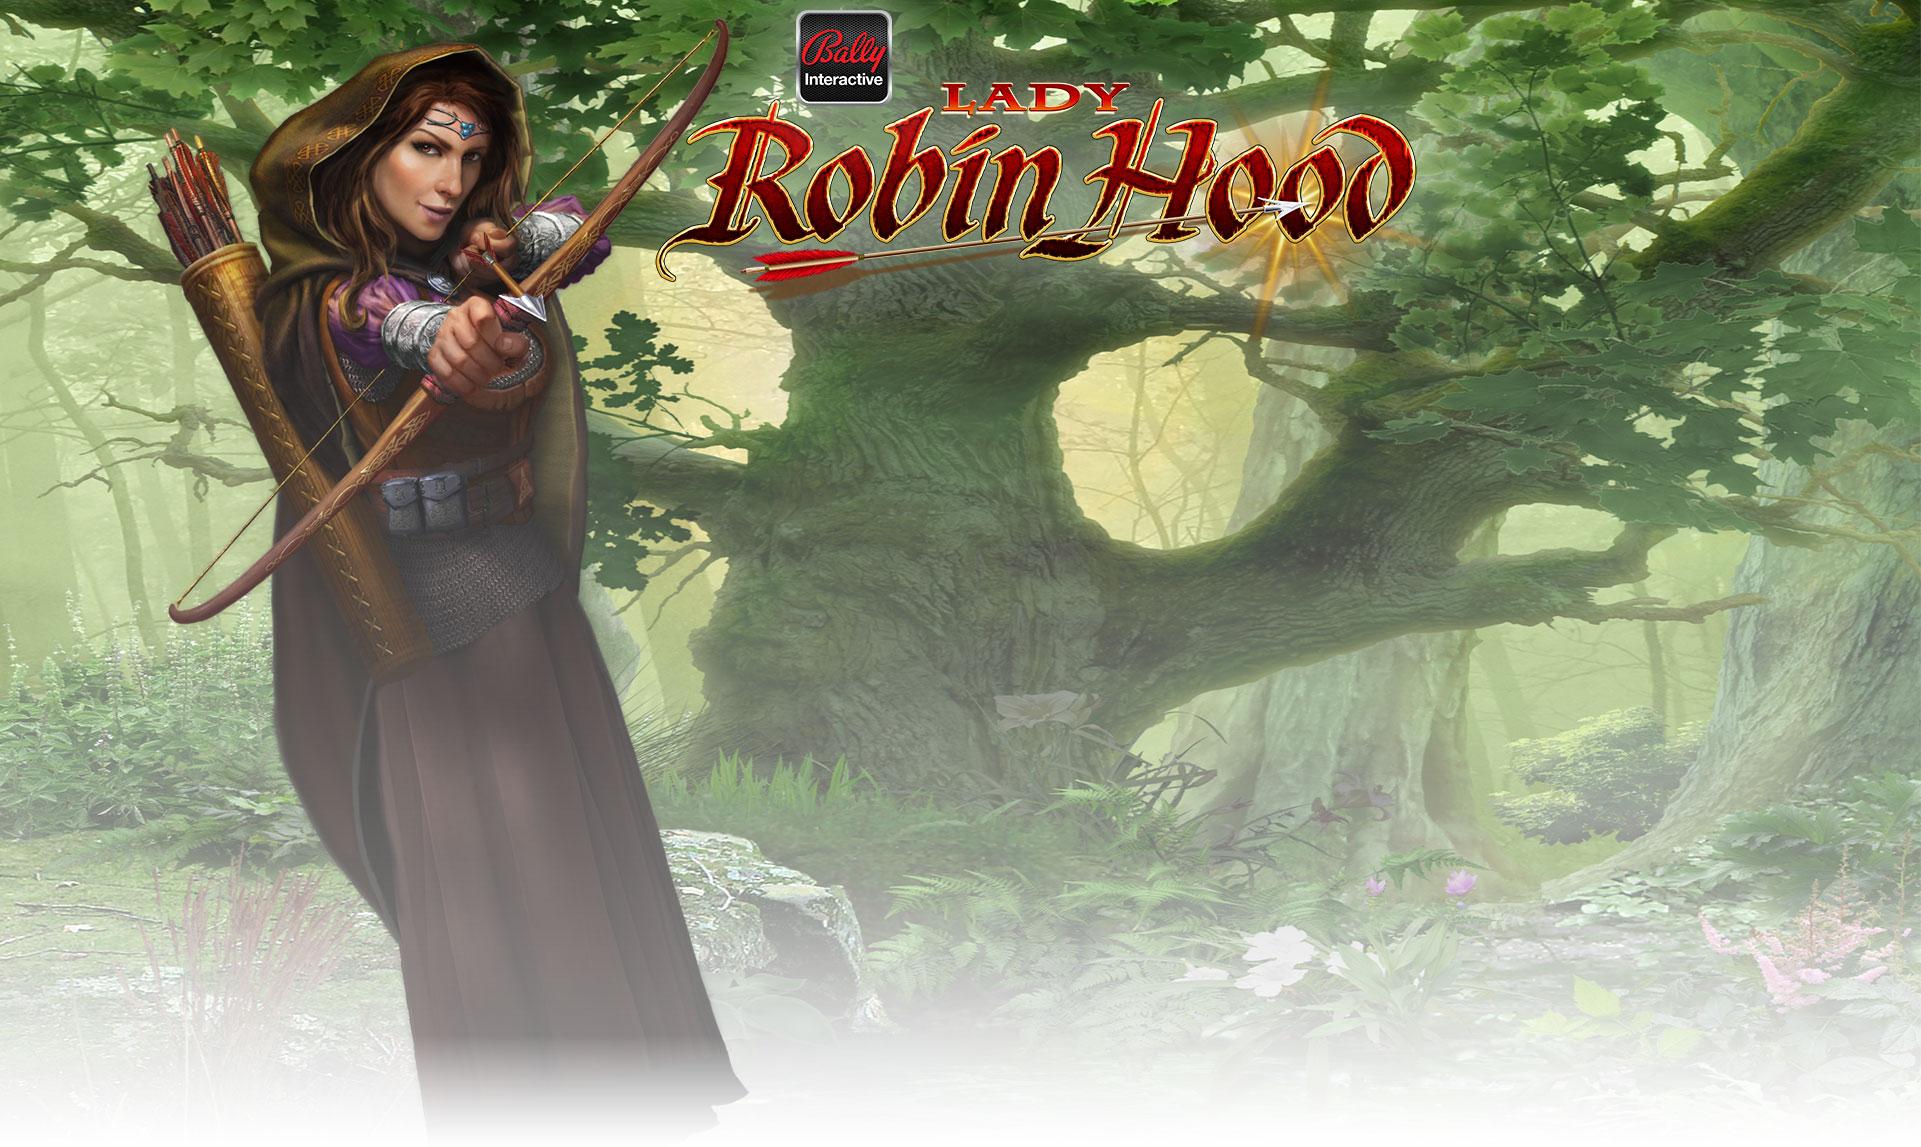 Robin Hood Lady